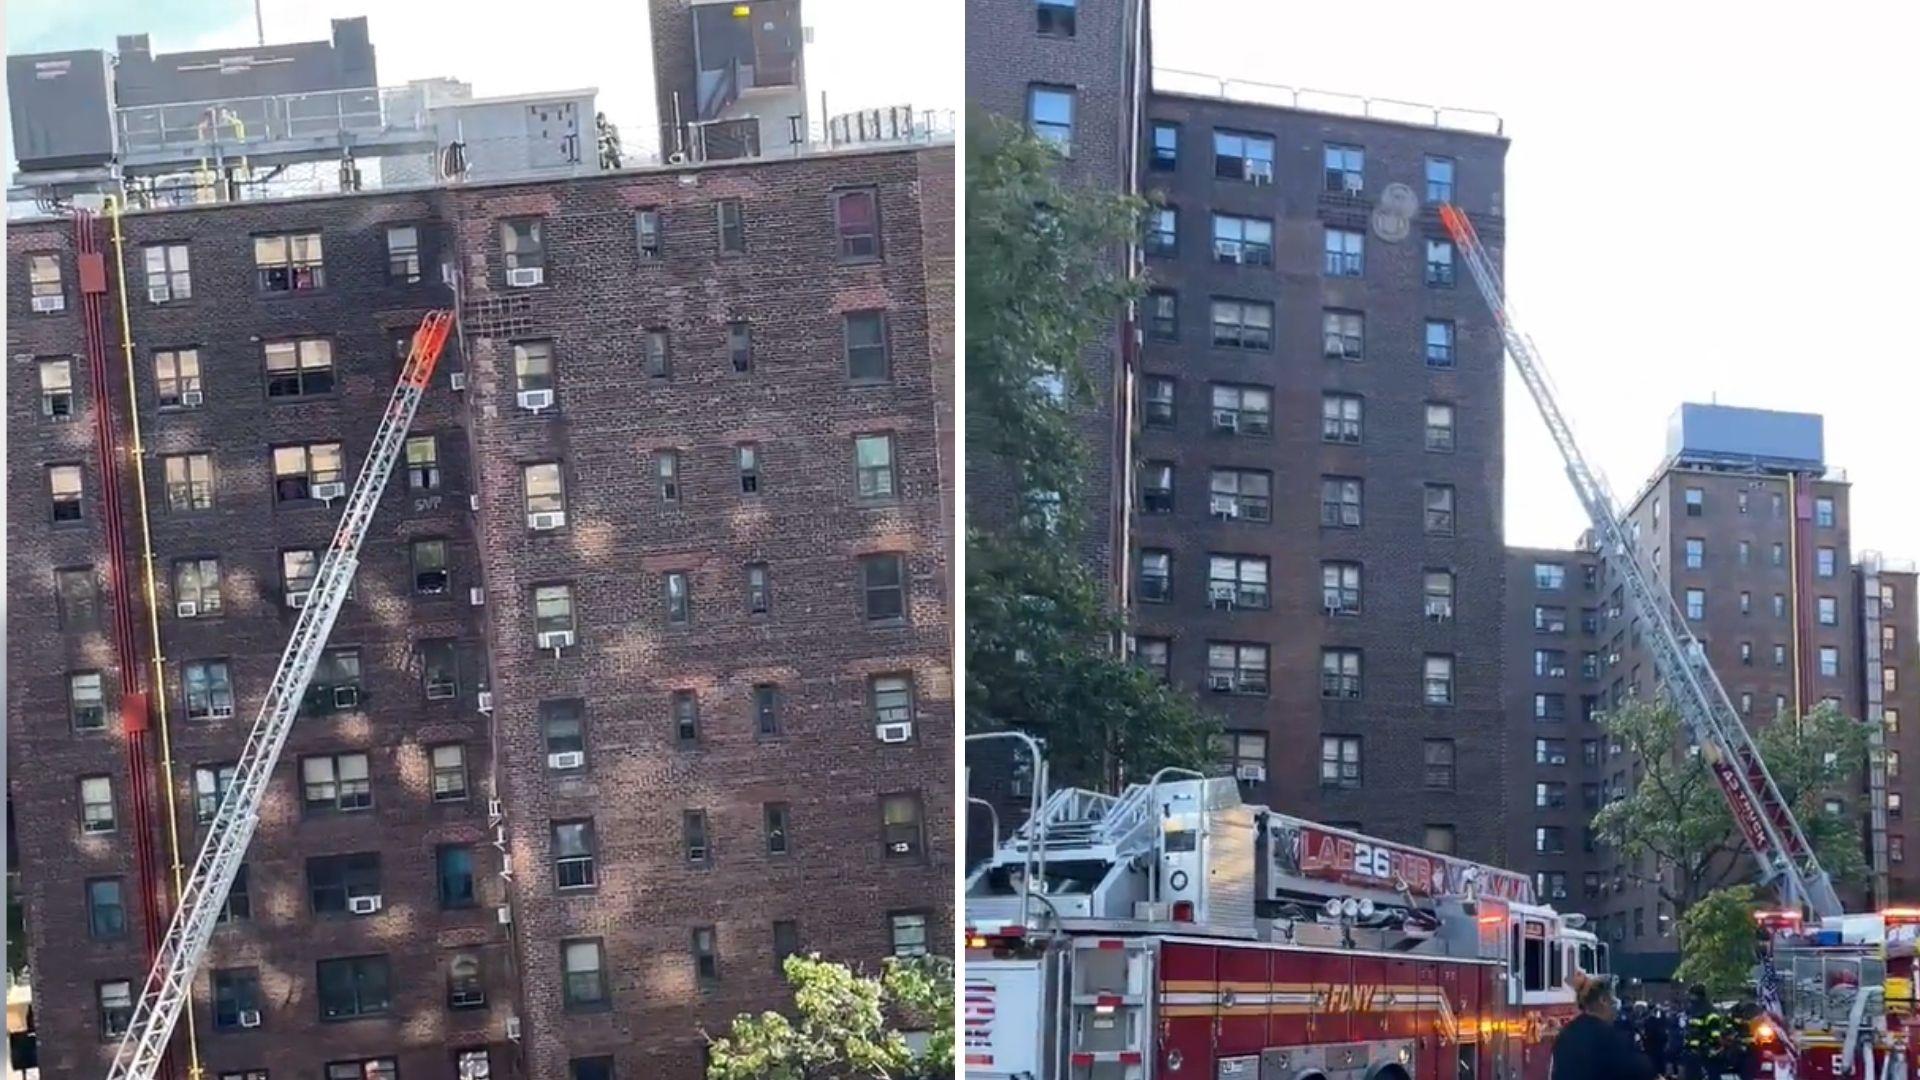 East Harlem fire